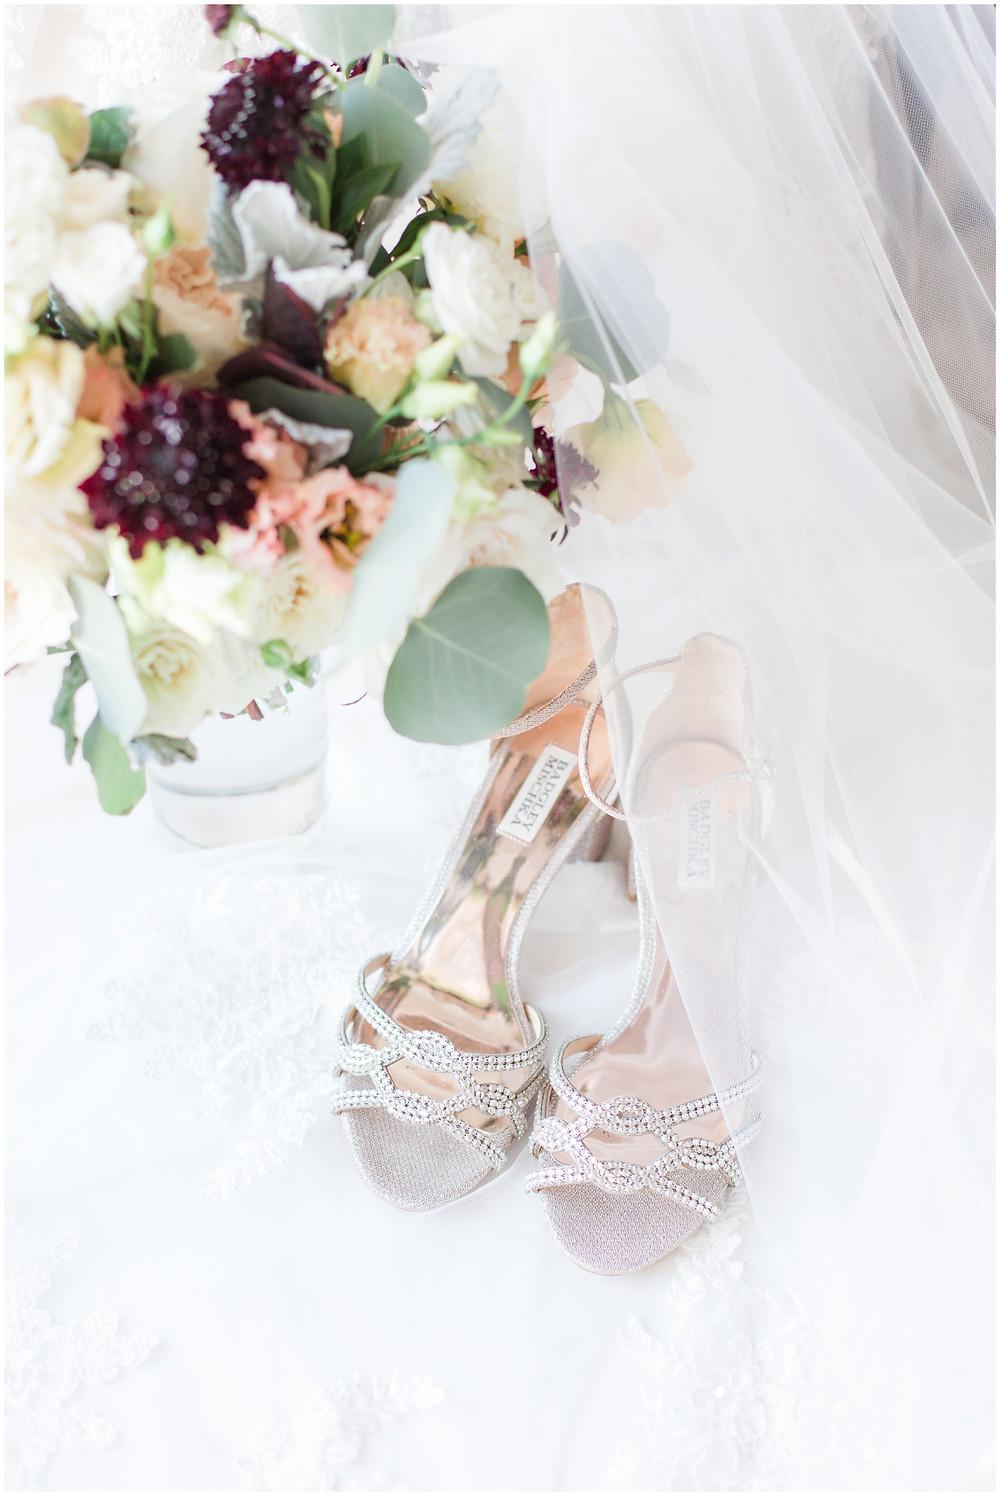 Los Poblanos wedding. summer wedding. wedding invitations. New mexico wedding. Outdoor wedding. Maura Jane Photography. wedding shoes. wedding bouquet